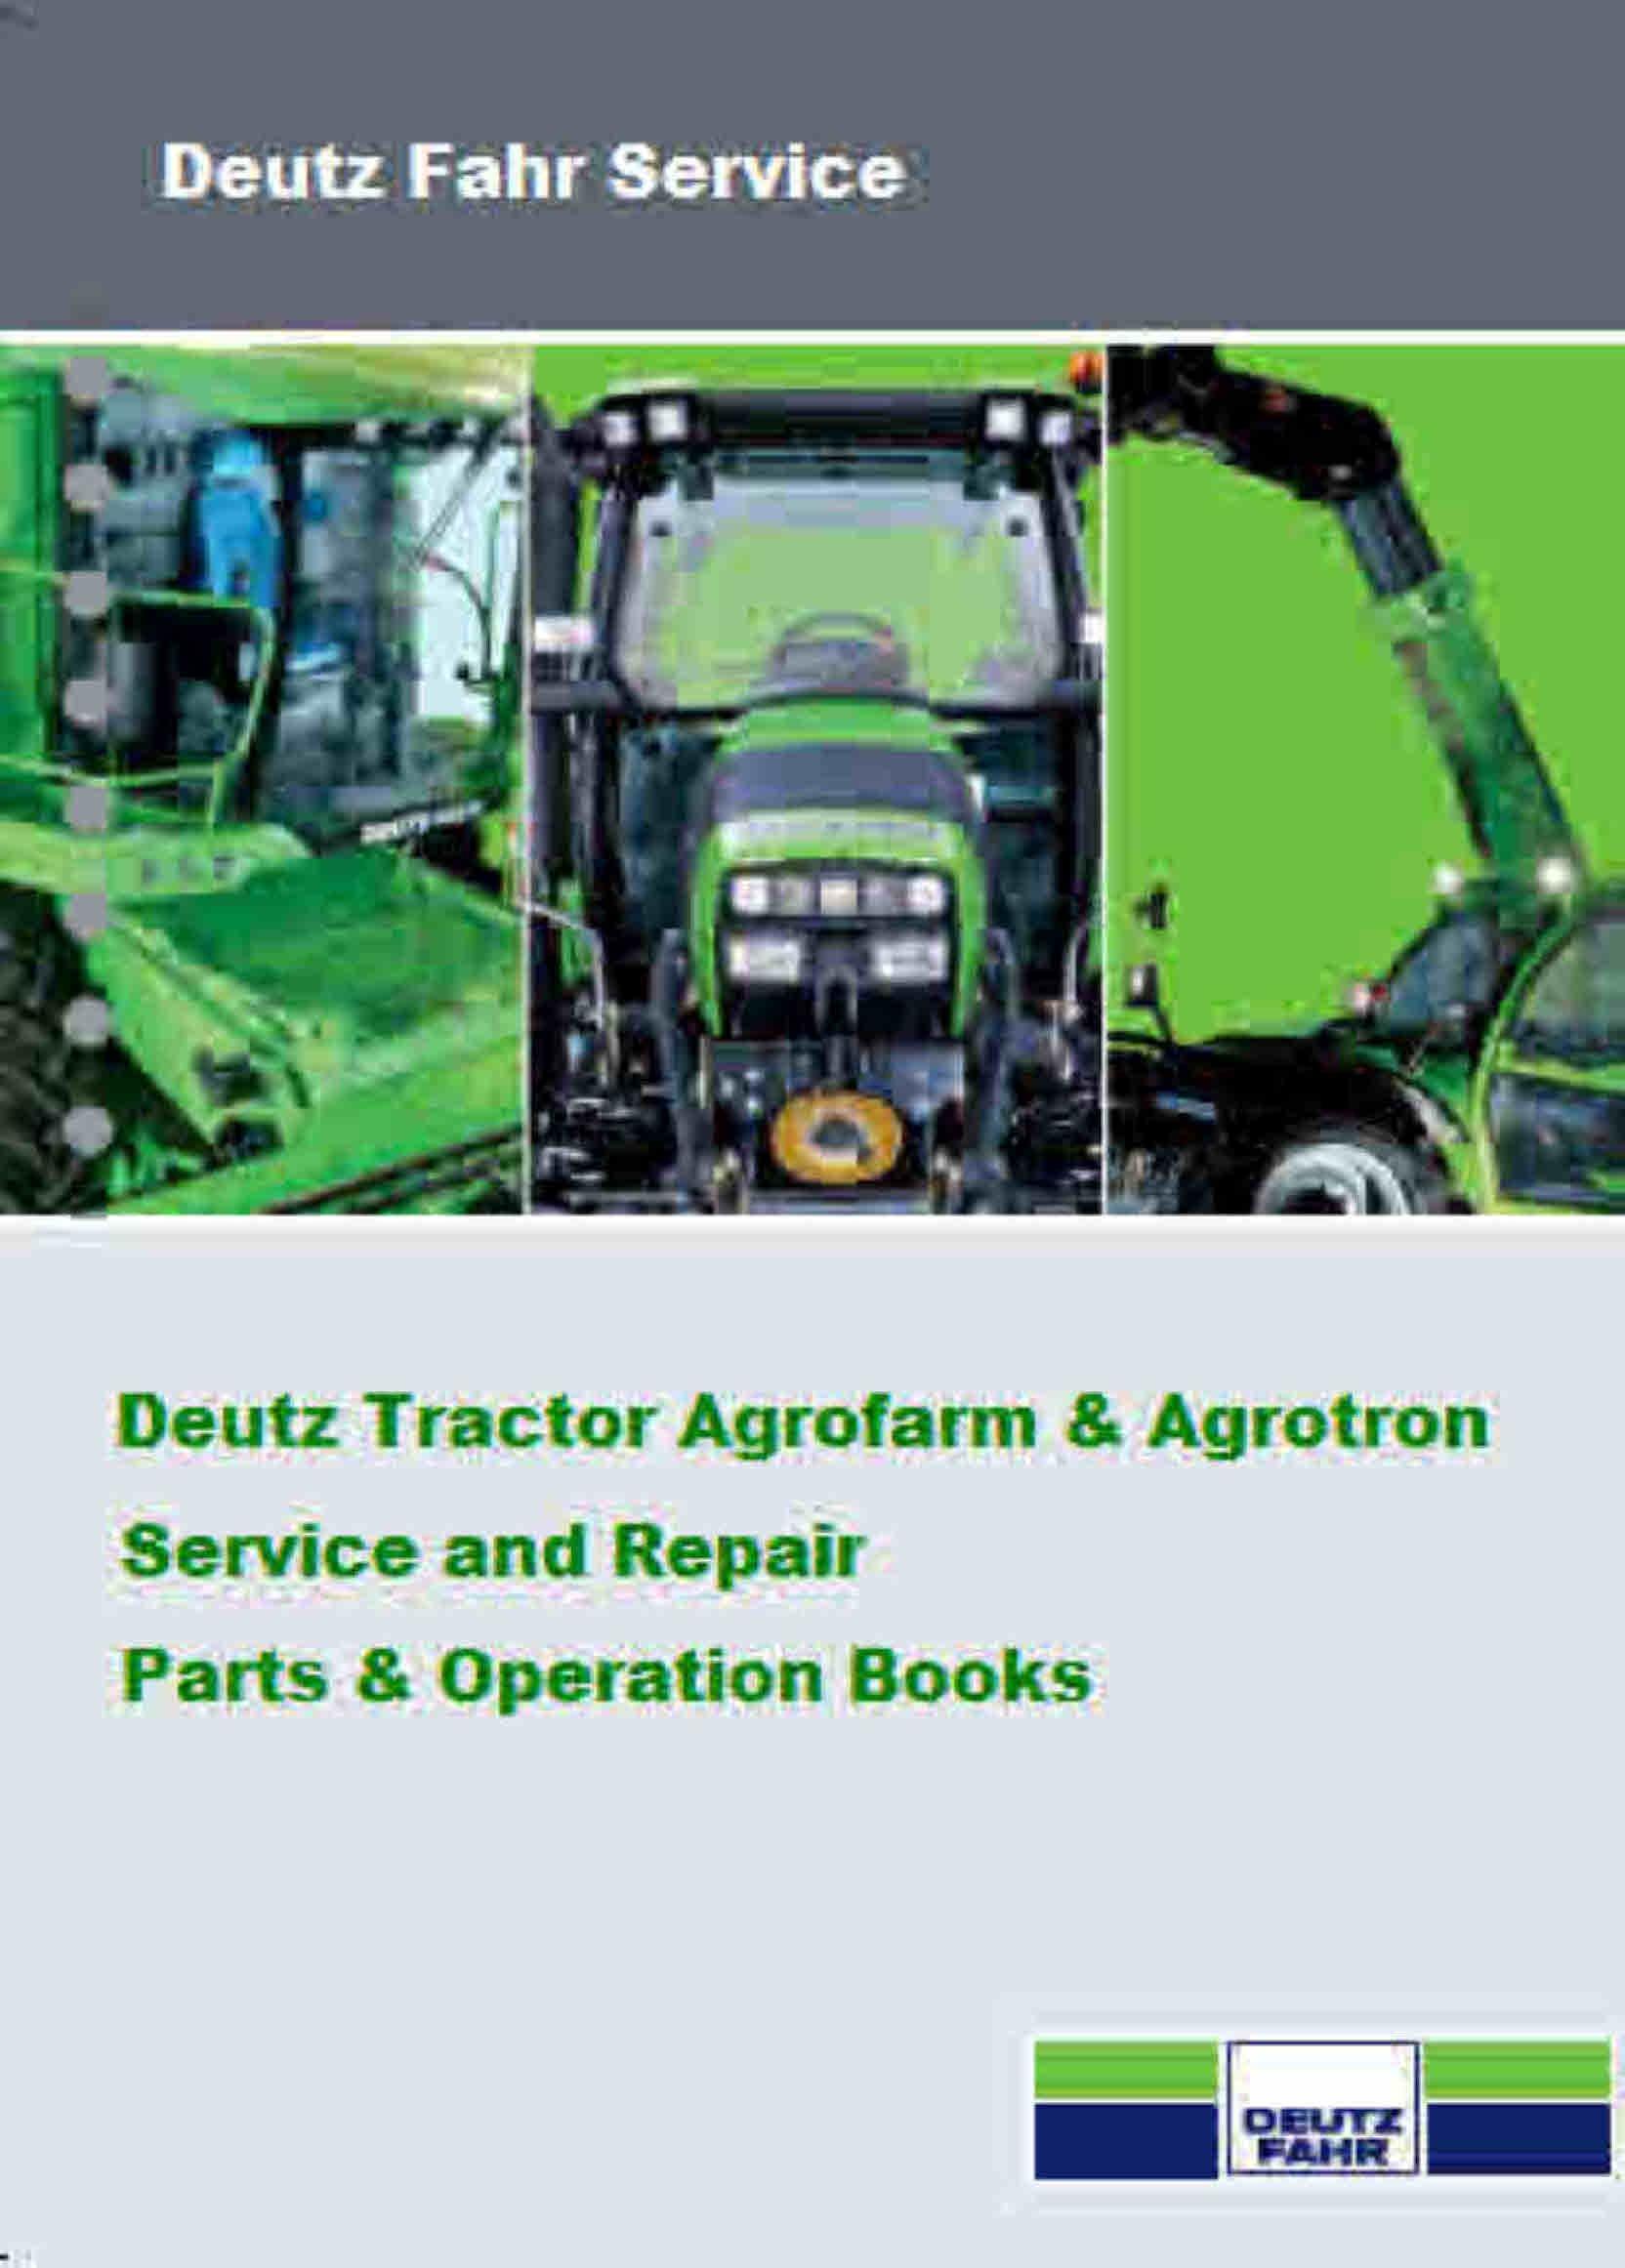 deutz tractor service manuals for mechanics rh sellfy com Deutz Parts  Breakdown deutz tractor workshop manuals